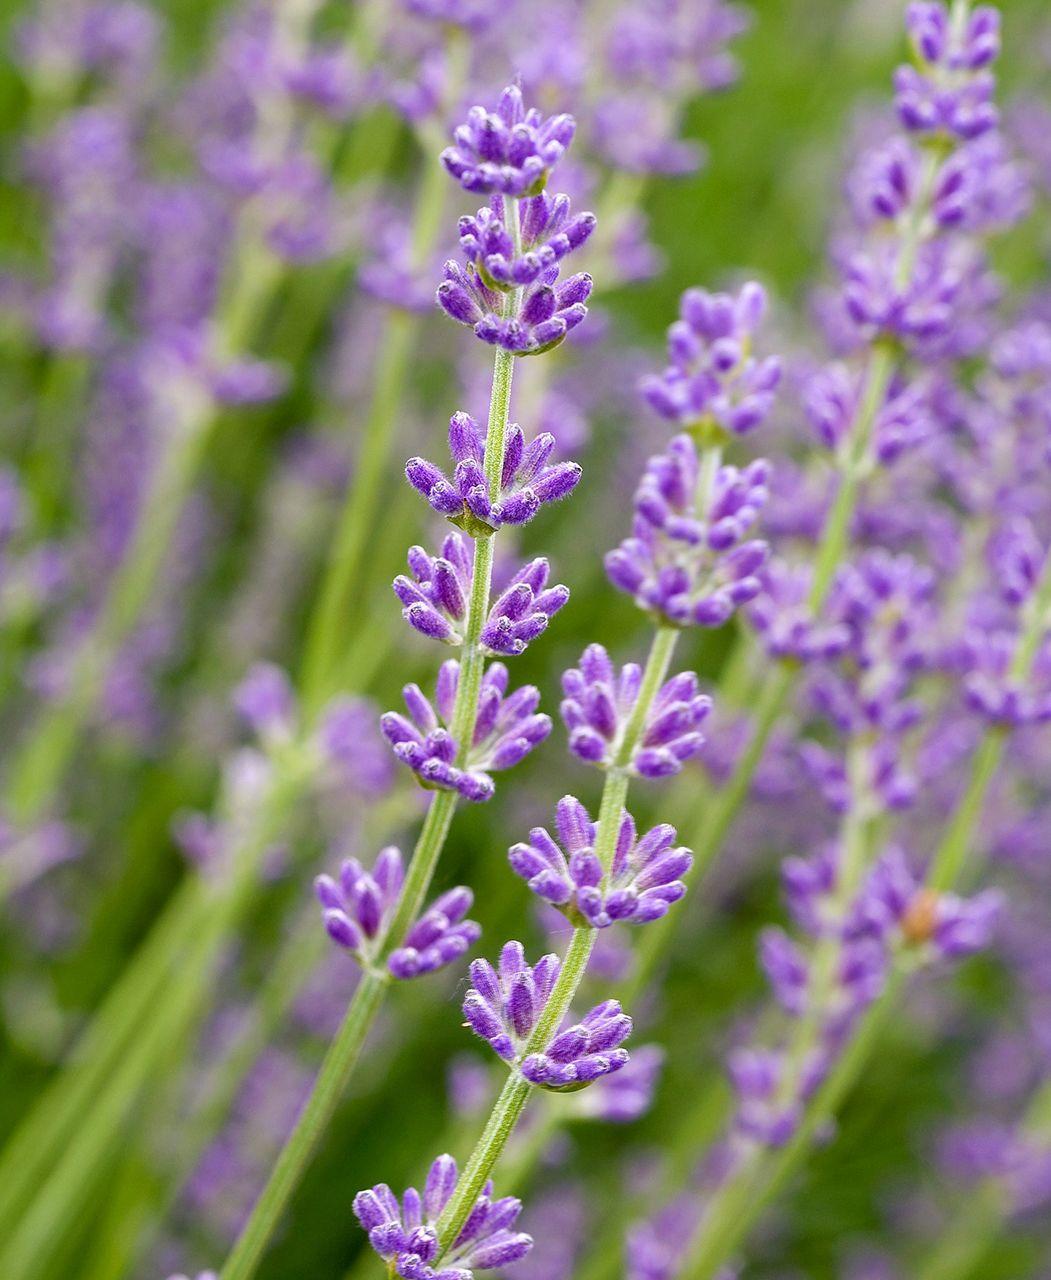 23 Top Lavender Varieties For Filling Your Garden With Color And Fragrance In 2020 Lavender Varieties Types Of Lavender Plants Violet Flower